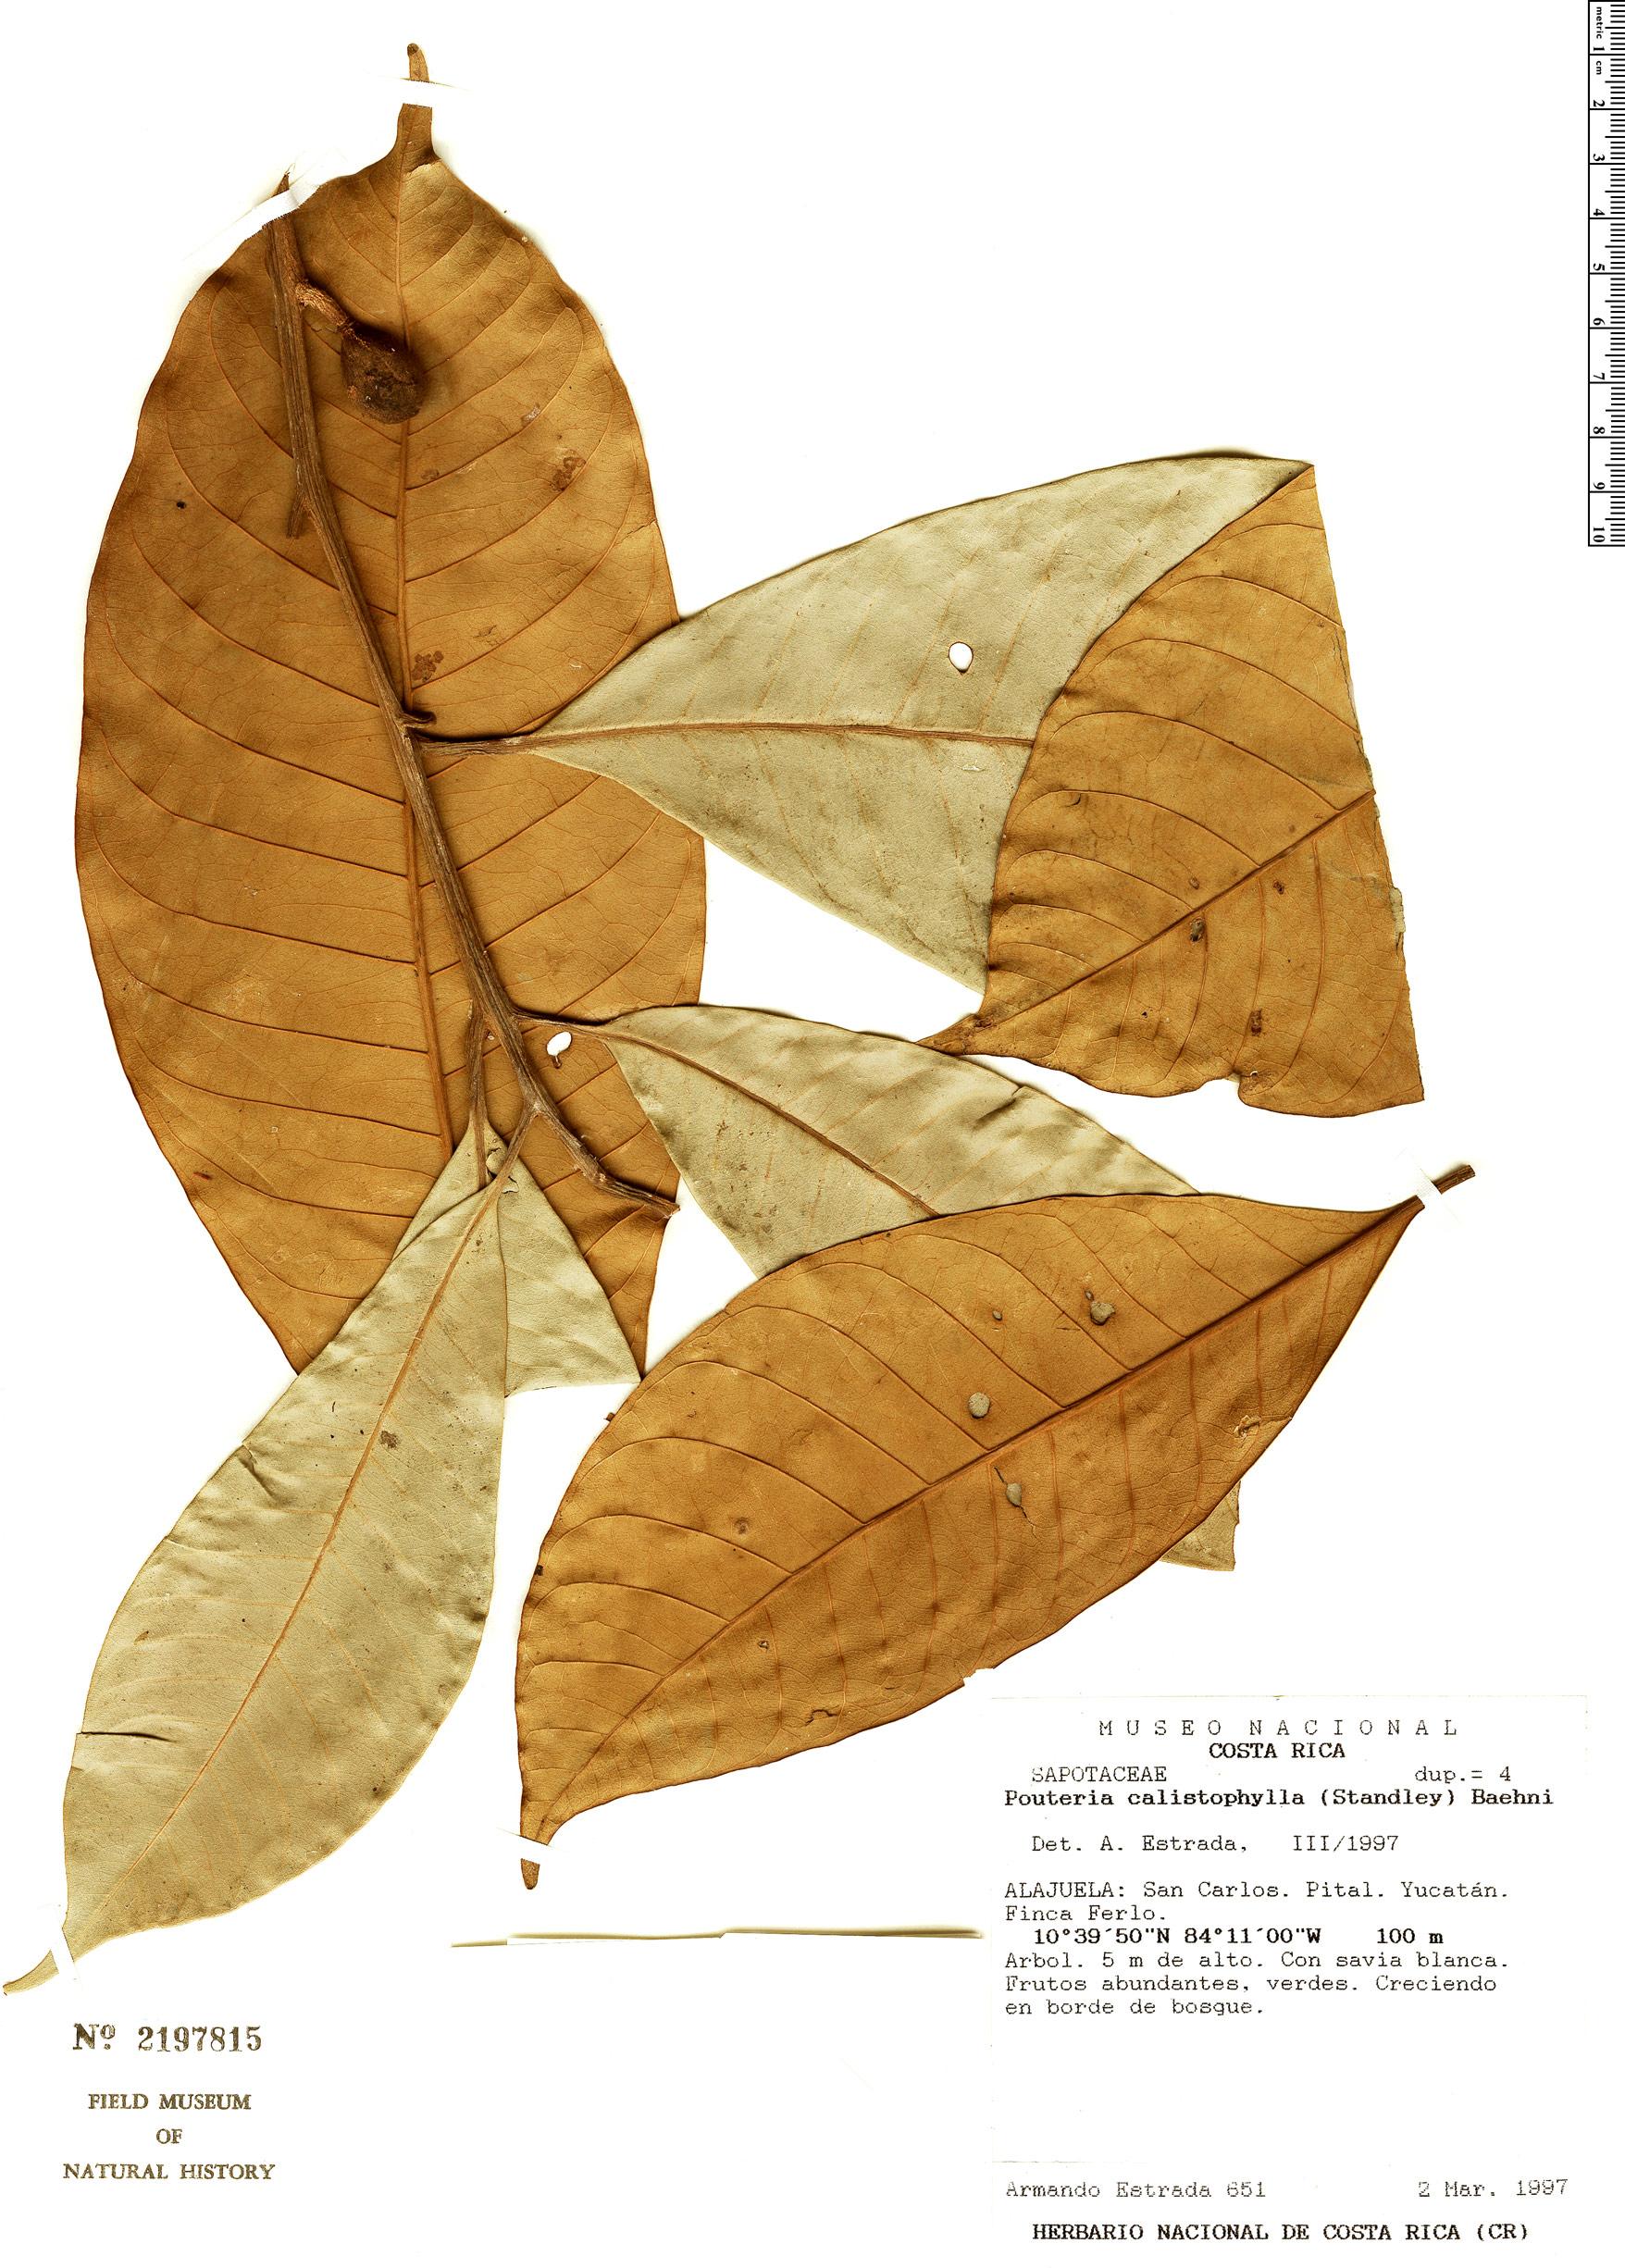 Specimen: Pouteria calistophylla